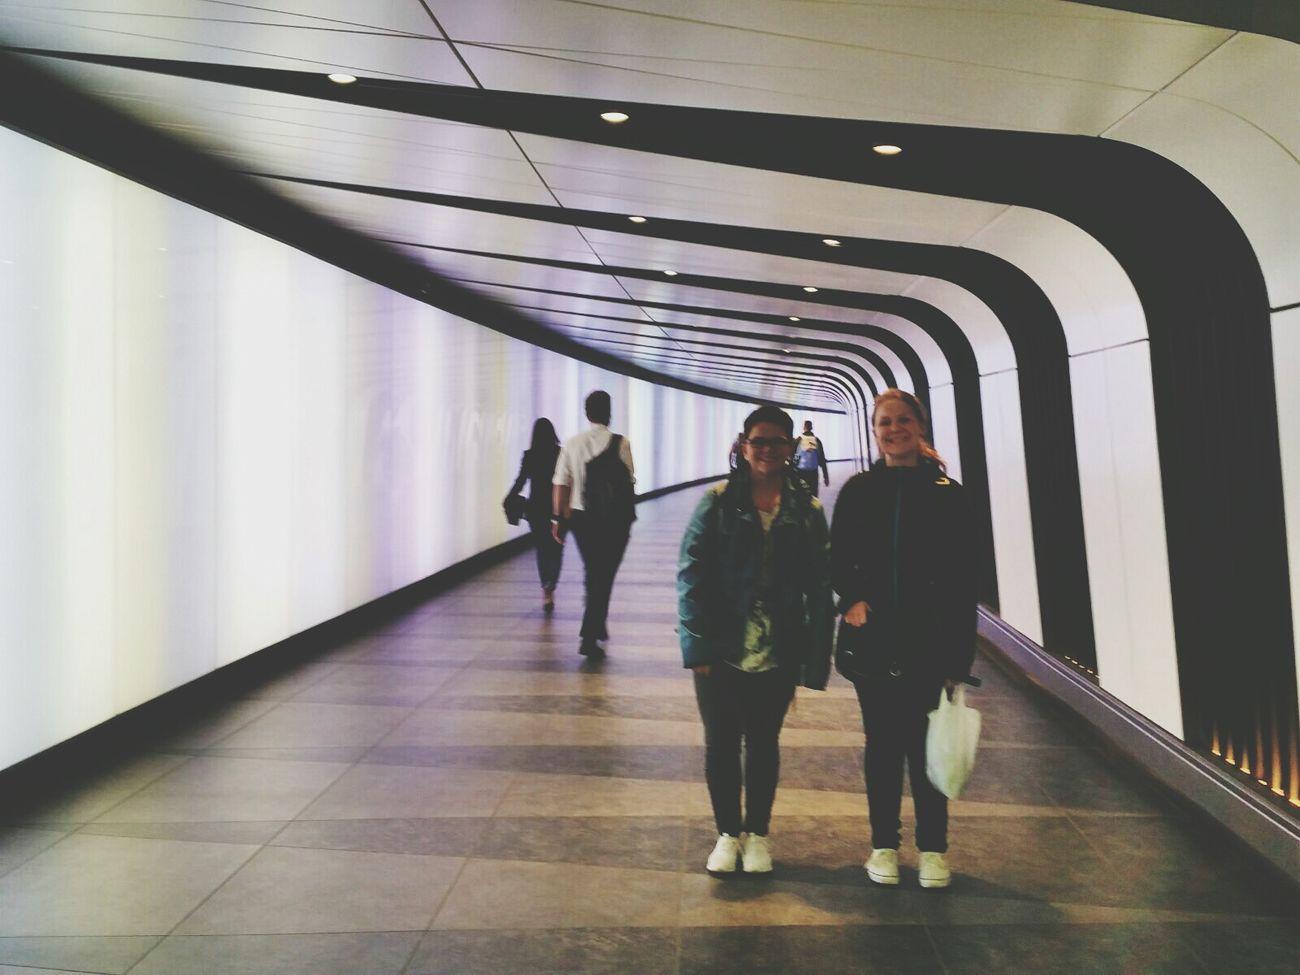 THESE Are My Friends London Subway Lovelovelove Trip Adventure Friendship LongTime  Trust Exploring